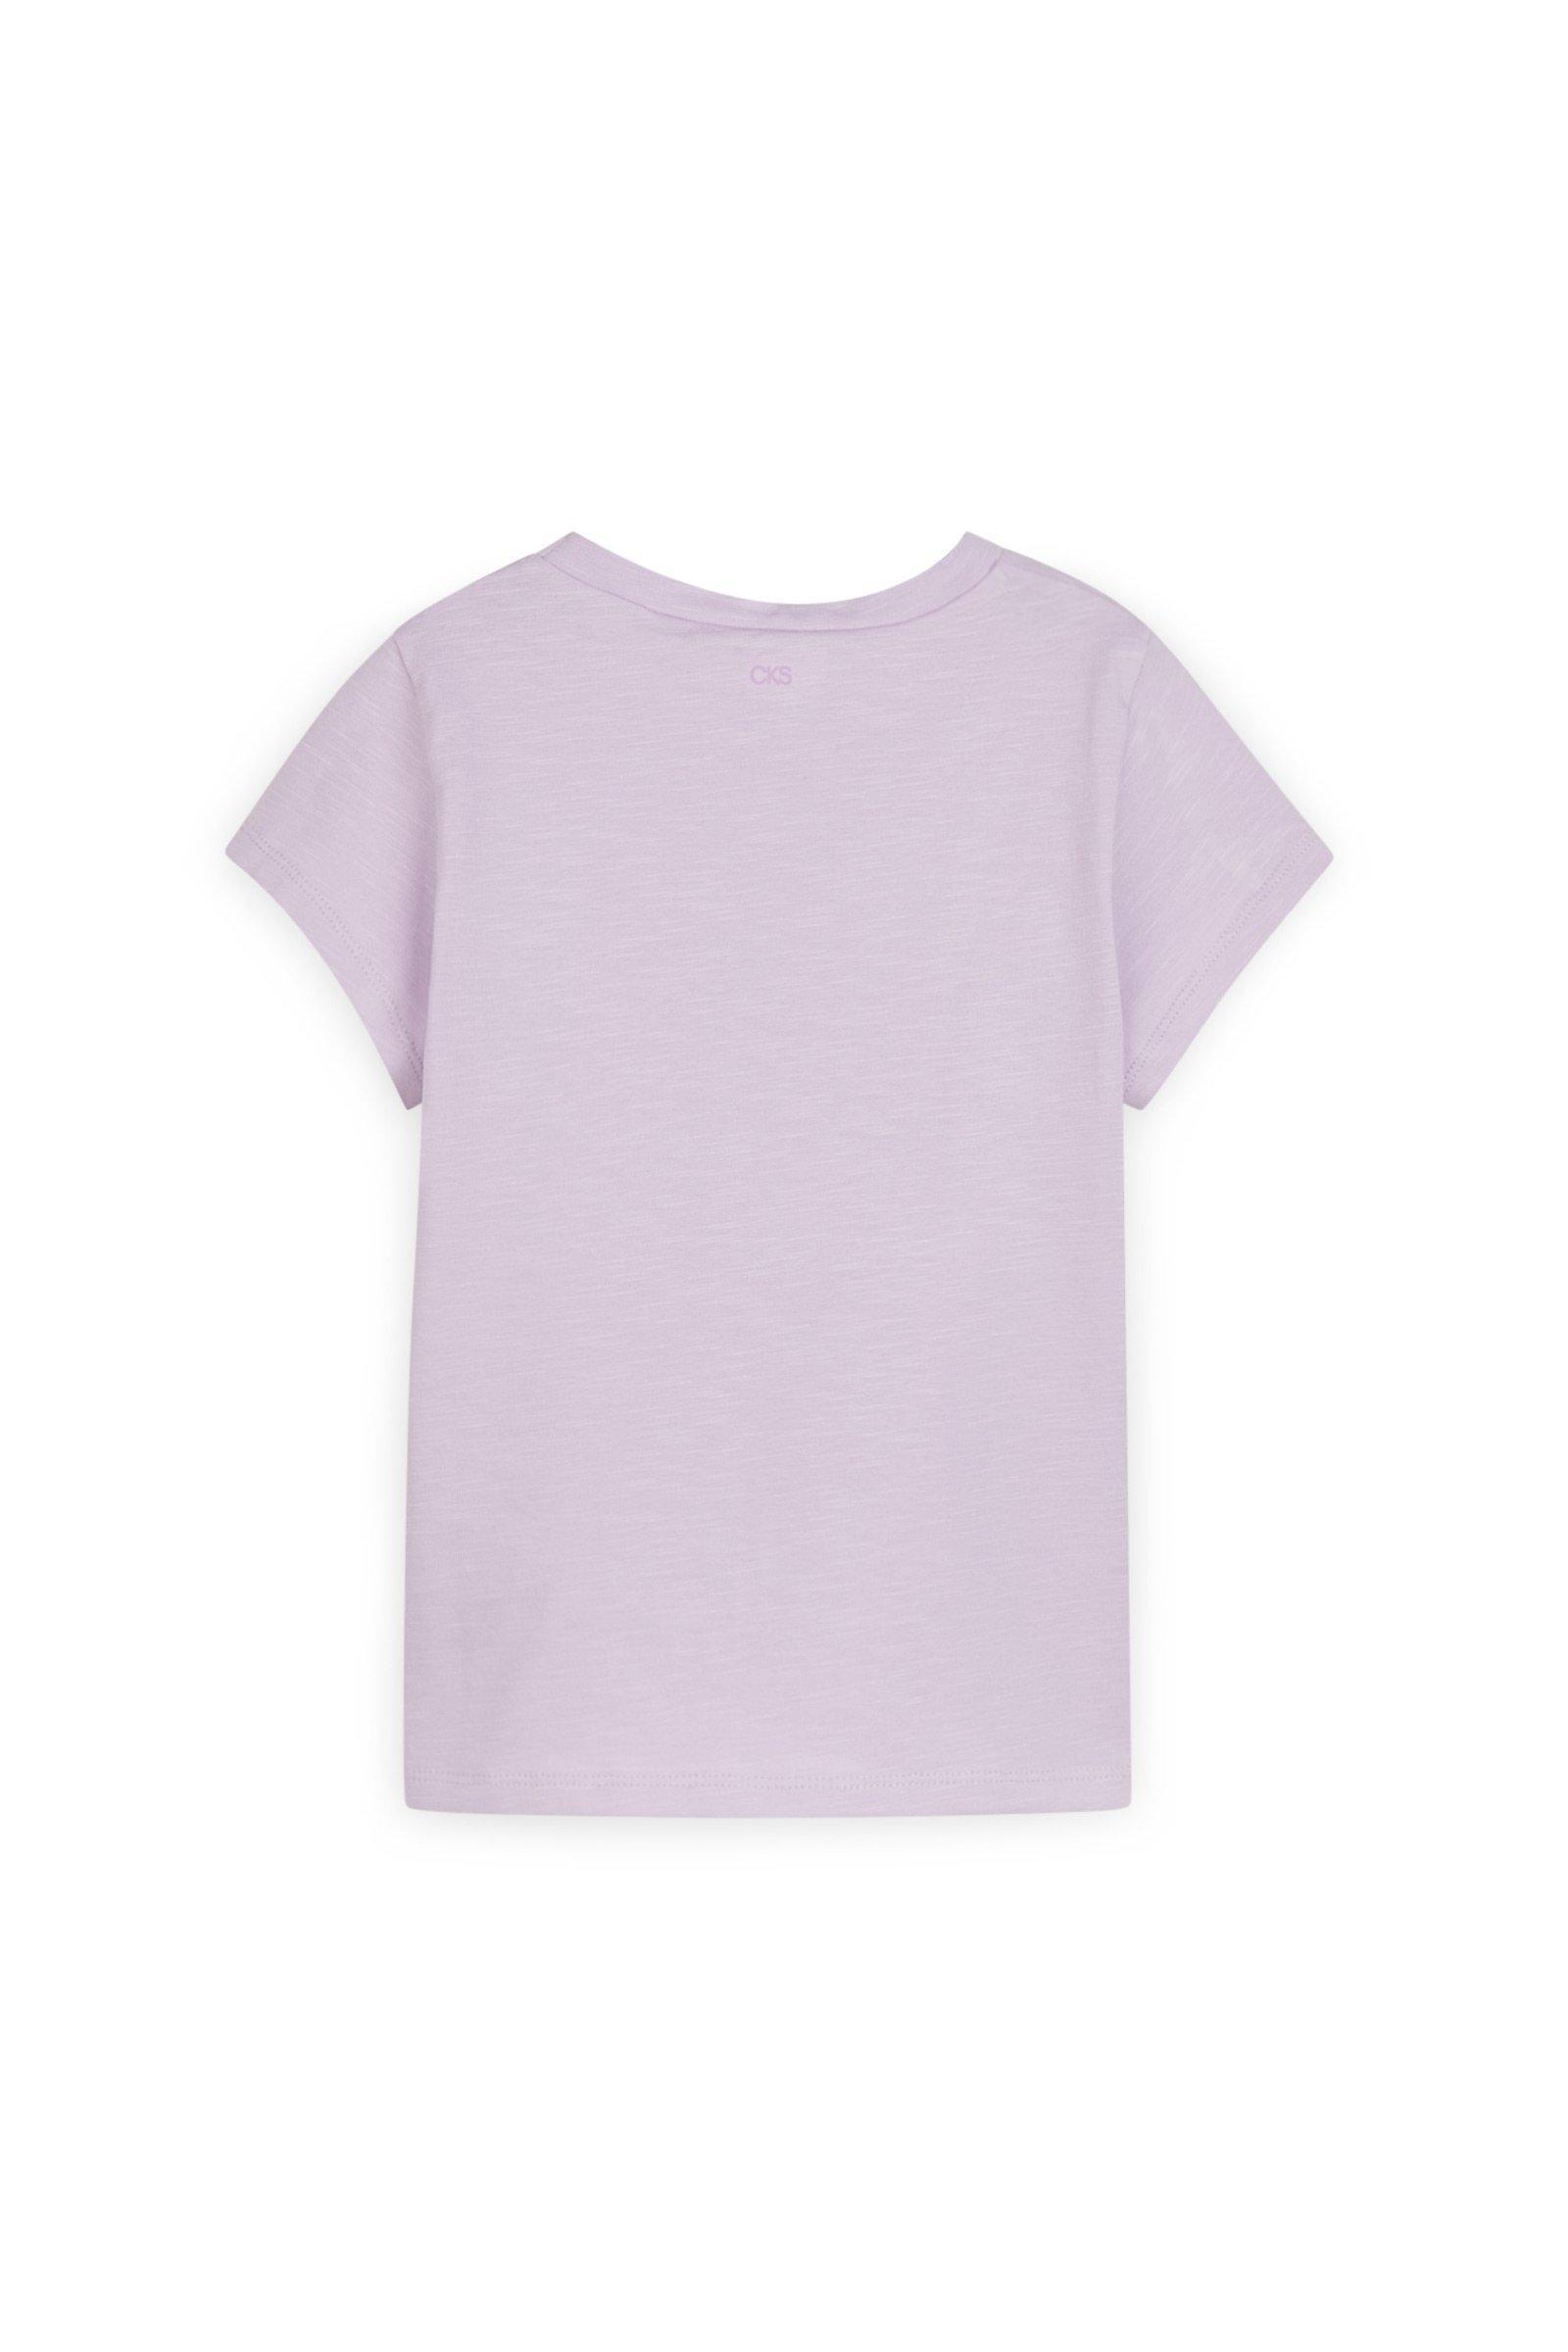 https://webmedia.cks-fashion.com/i/cks/123191RSM_100_h